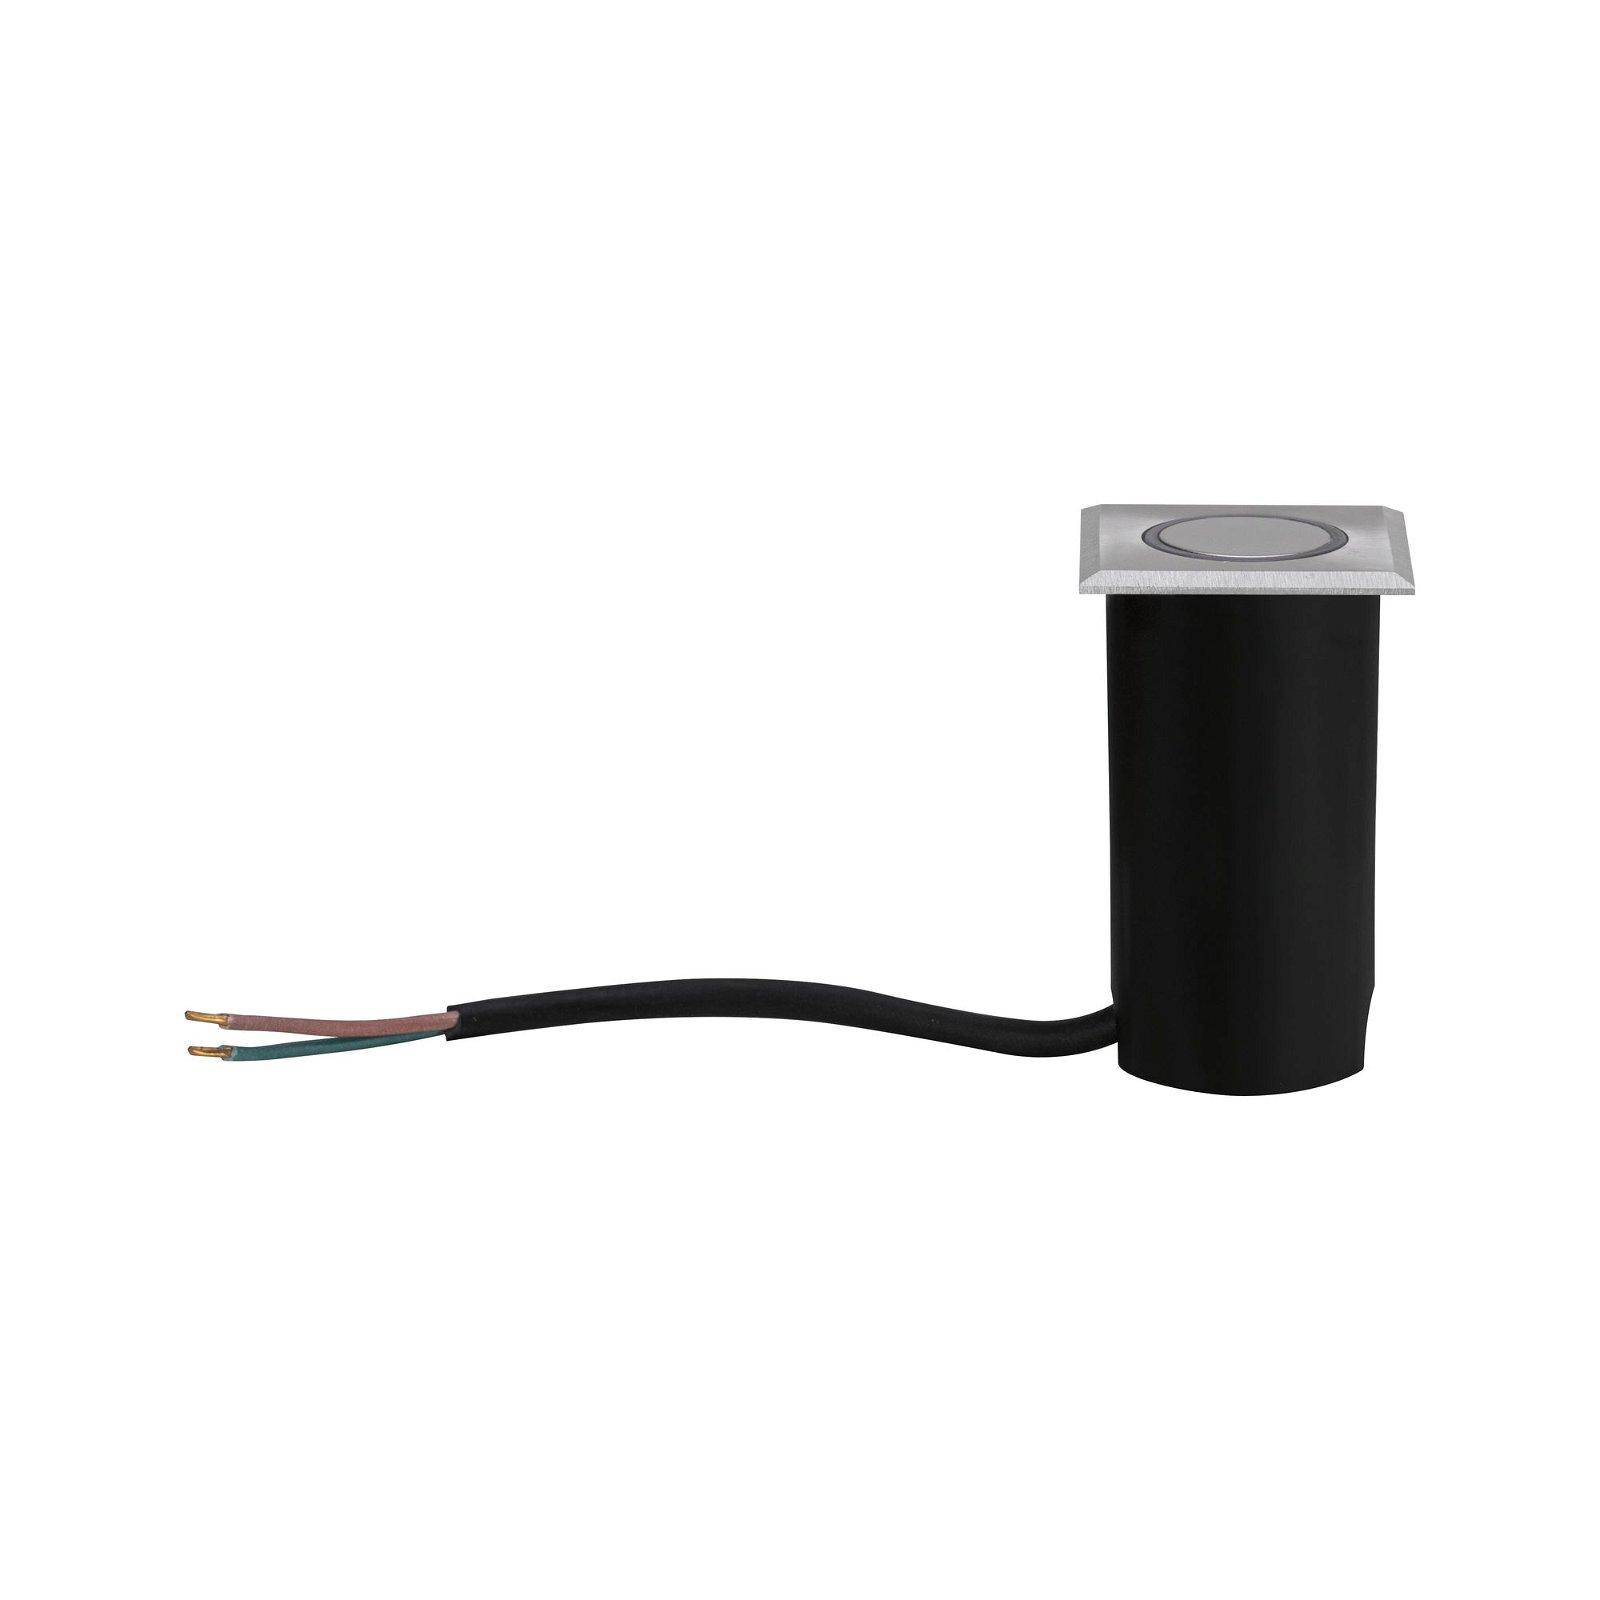 House LED-grondinbouwlamp IP65 hoekig 50x50mm 3000K 2W 210lm 230V Edelstaal geborsteld edelstaal/Kunststof